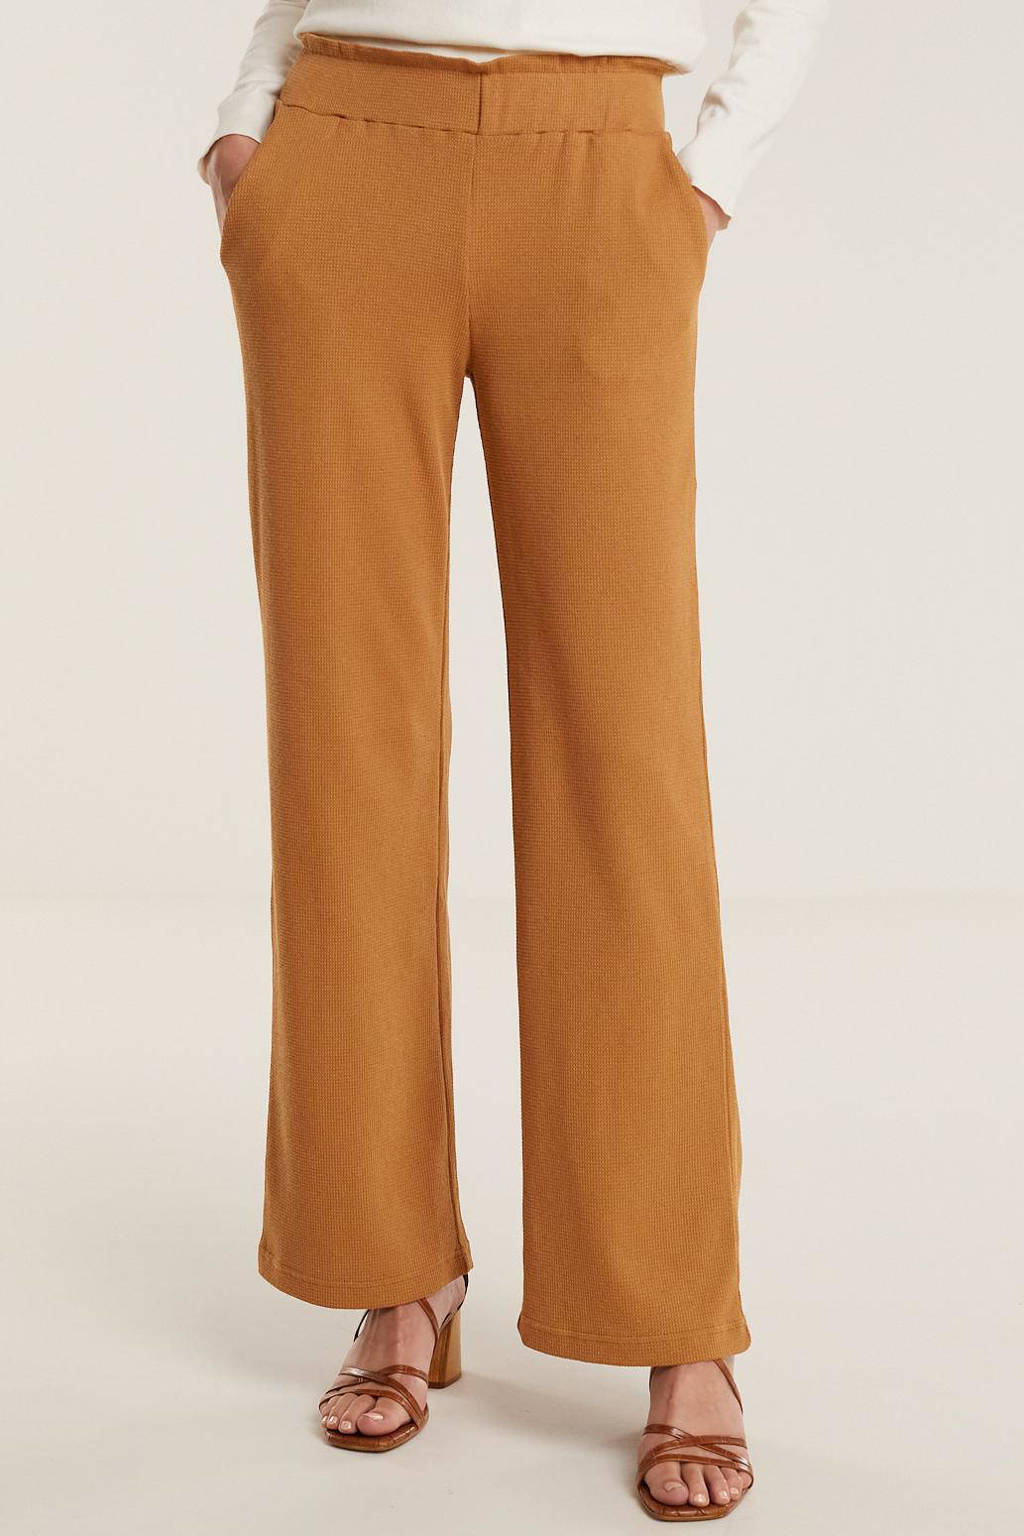 Another-Label broek Arielle met textuur lichtbruin, Lichtbruin